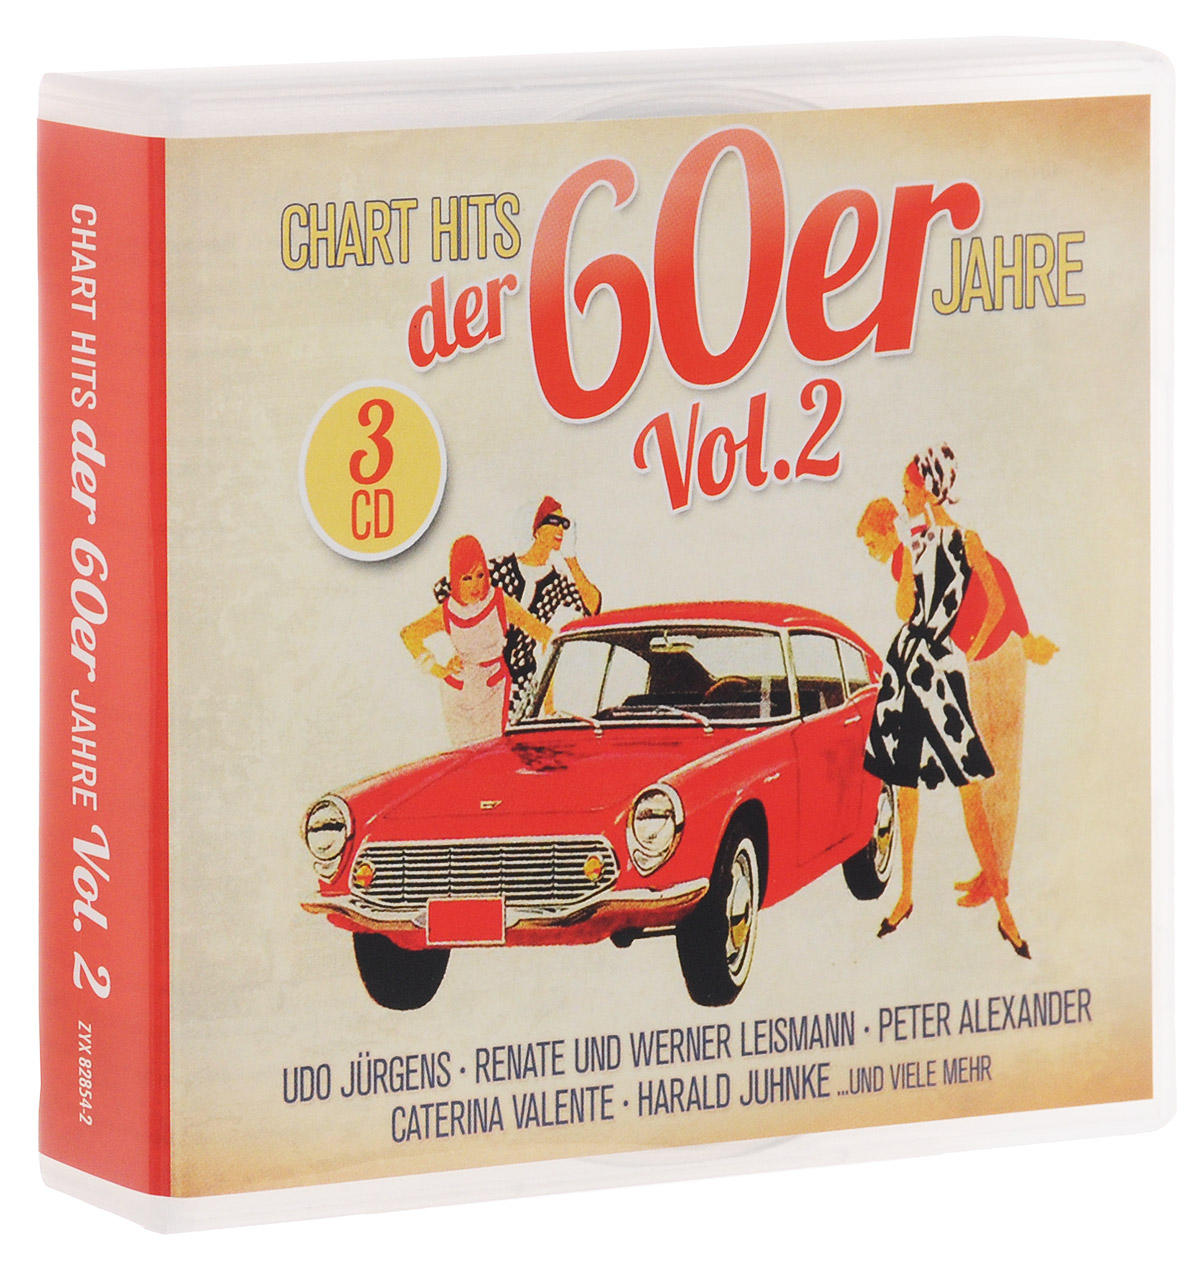 Chart Hits Der 60er Jahre Vol. 2 (3 CD) ботинки der spur der spur de034amwiz42